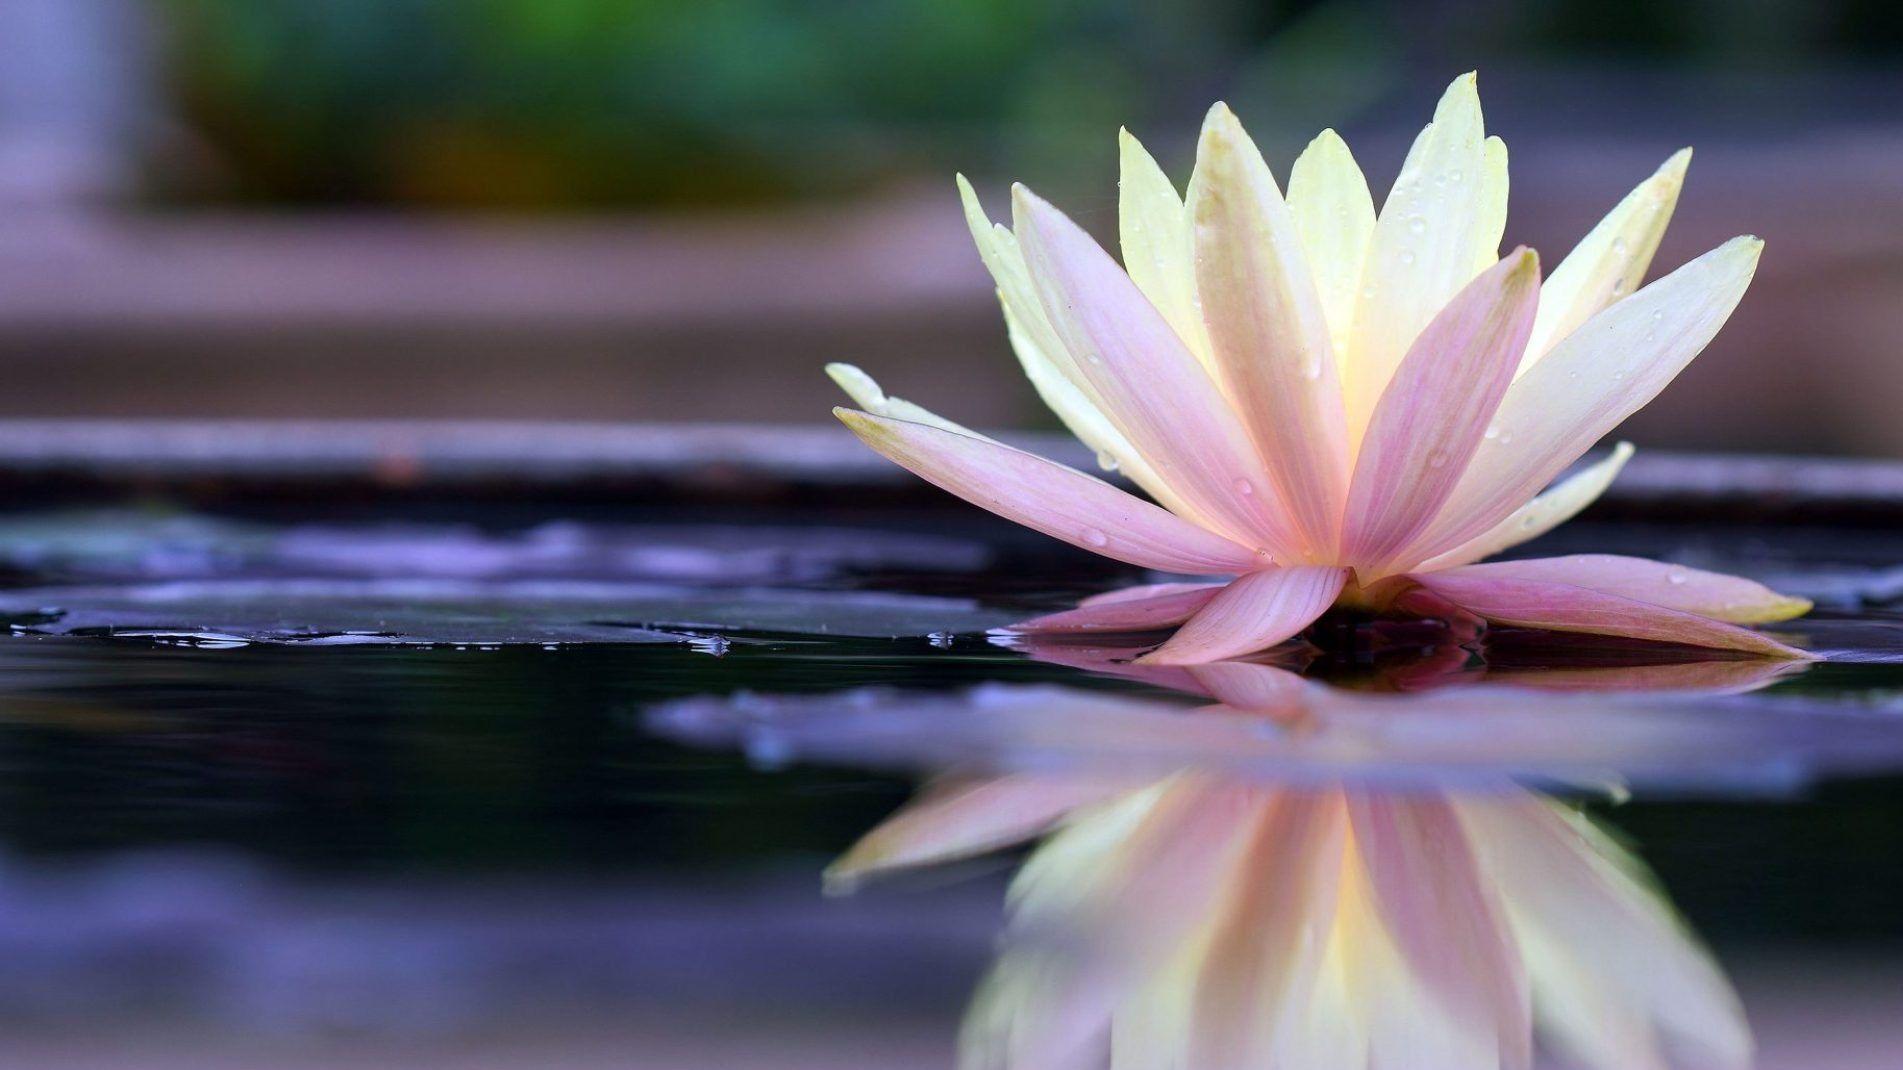 Chakra Bliss Center: Modern  Energy Medicine and Shamanism